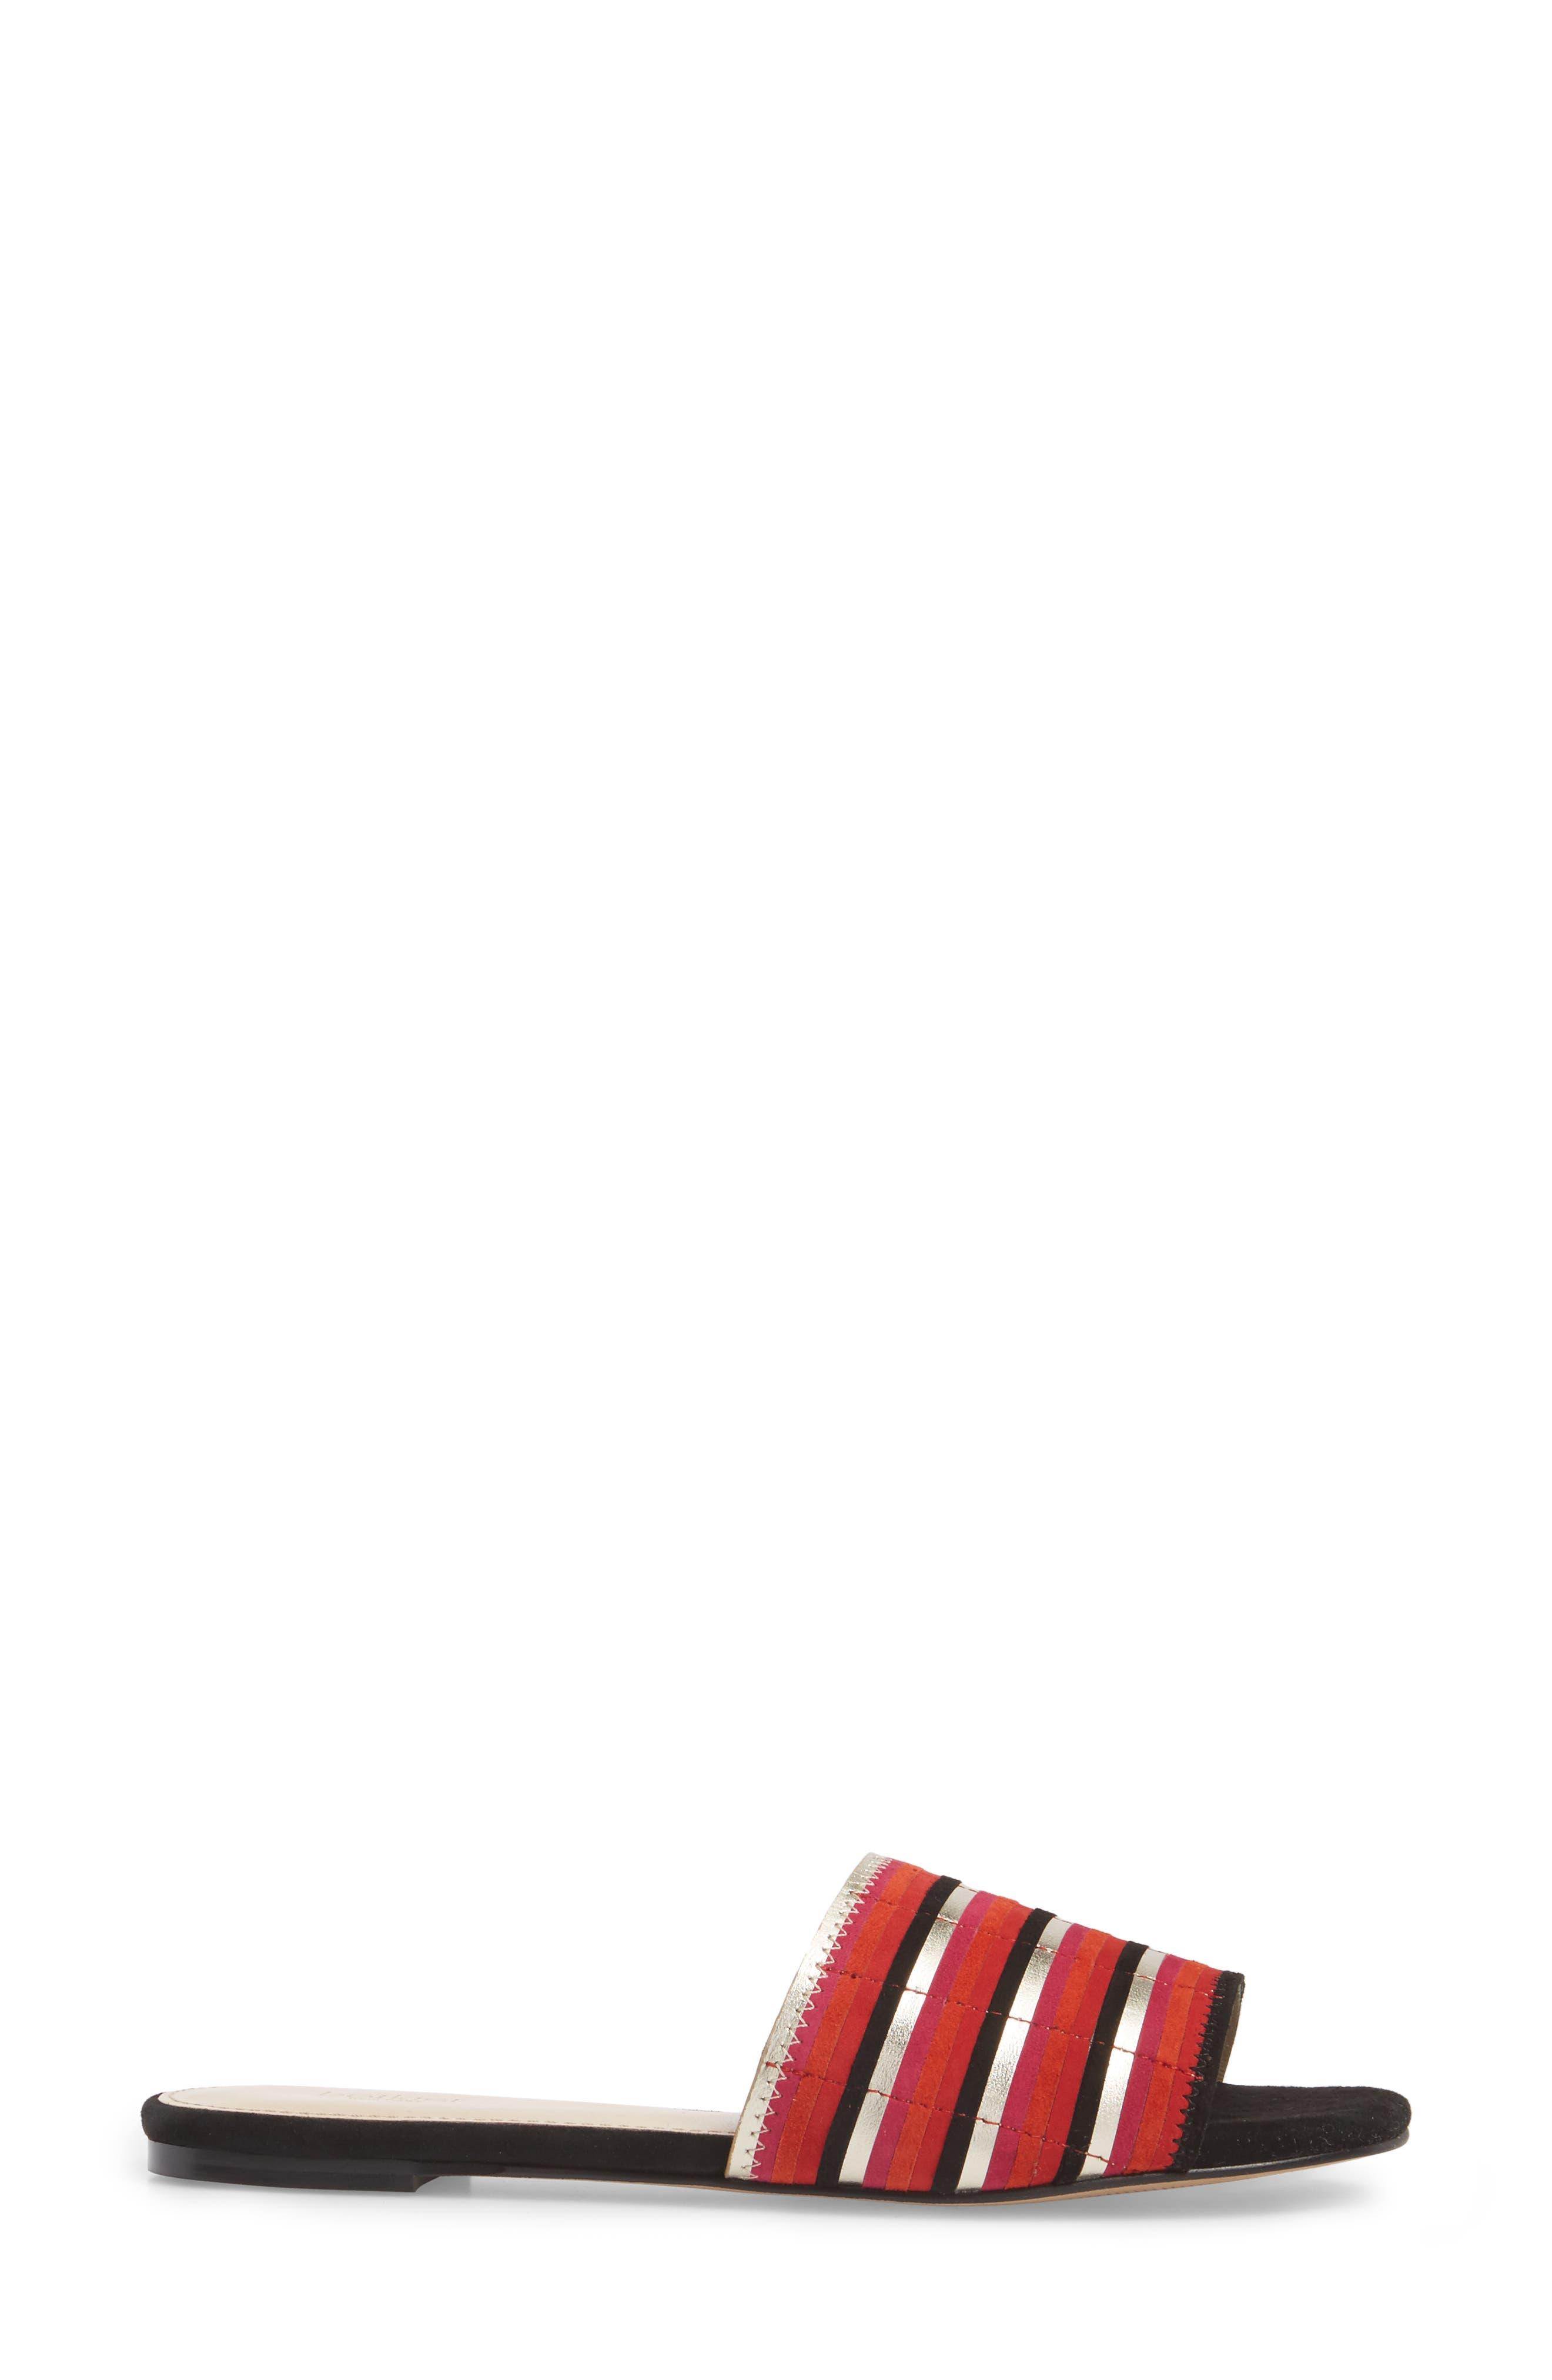 Marley Slide Sandal,                             Alternate thumbnail 3, color,                             Poppy Suede